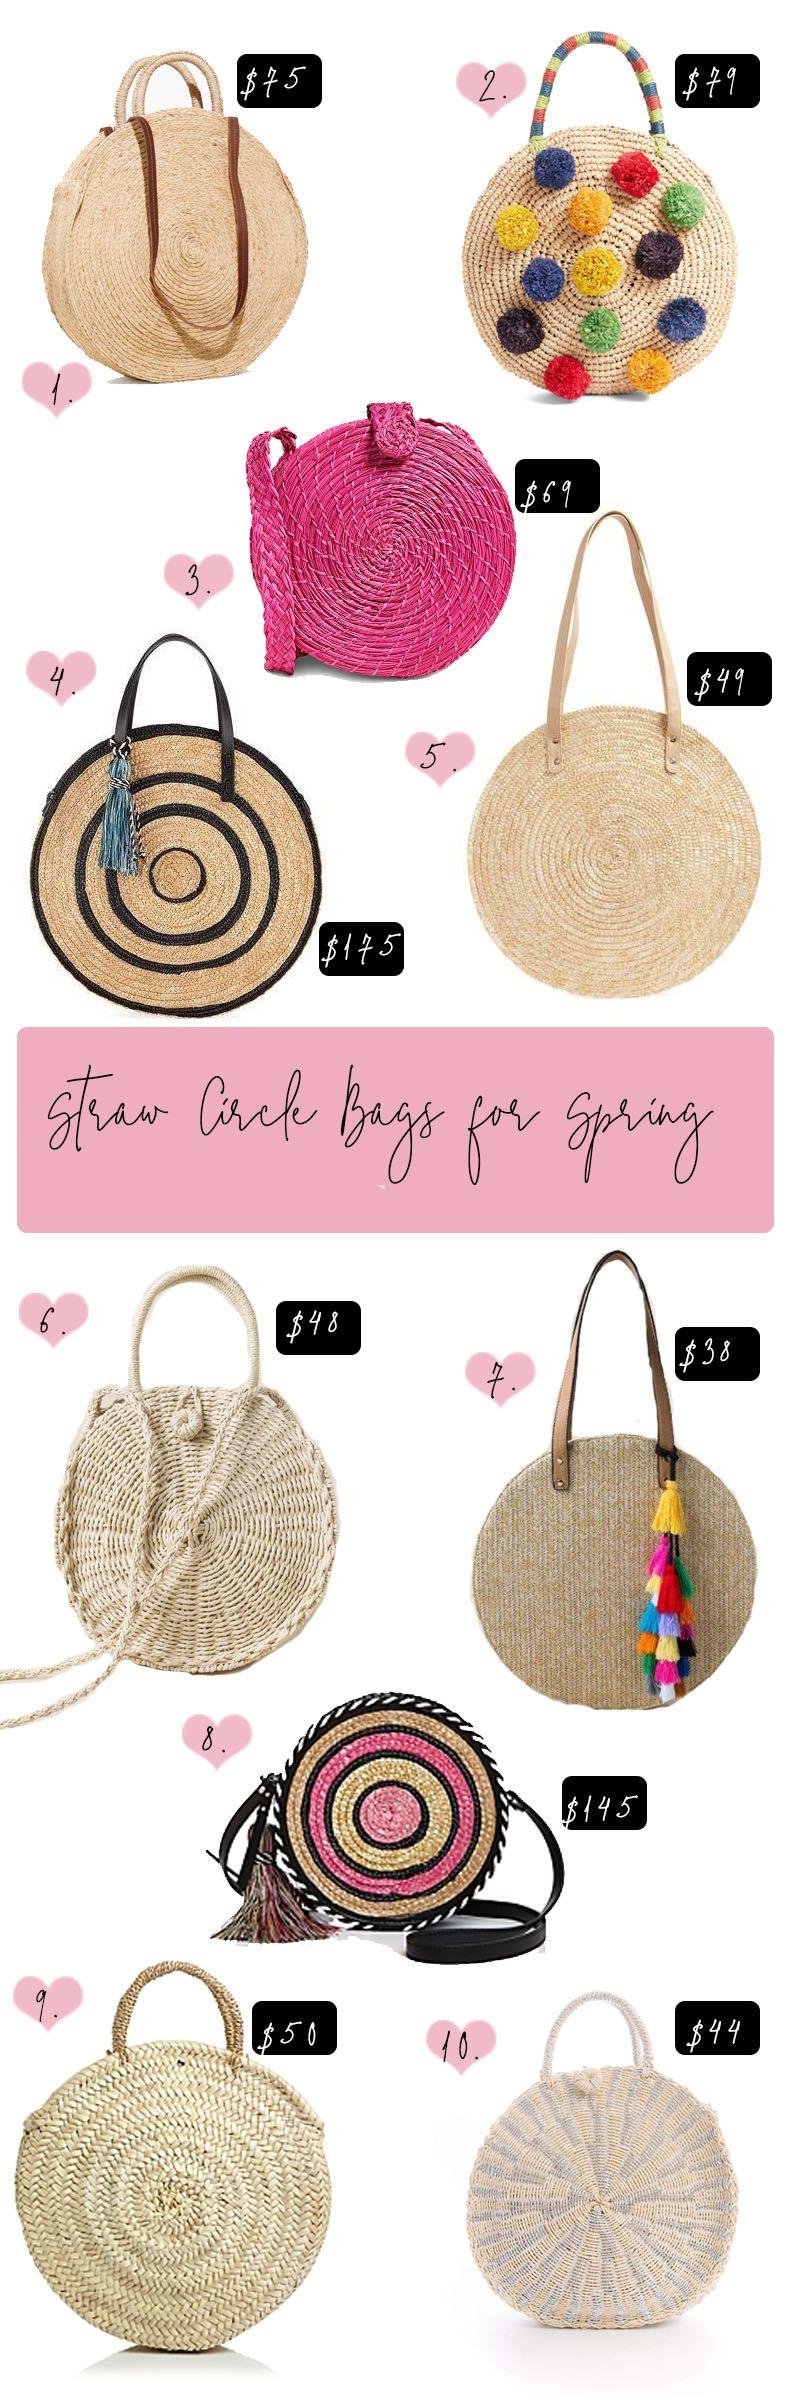 Gaia\'s Arc, JADEtribe Pom Pom Small Basket, Clare V Alice Sisal ...